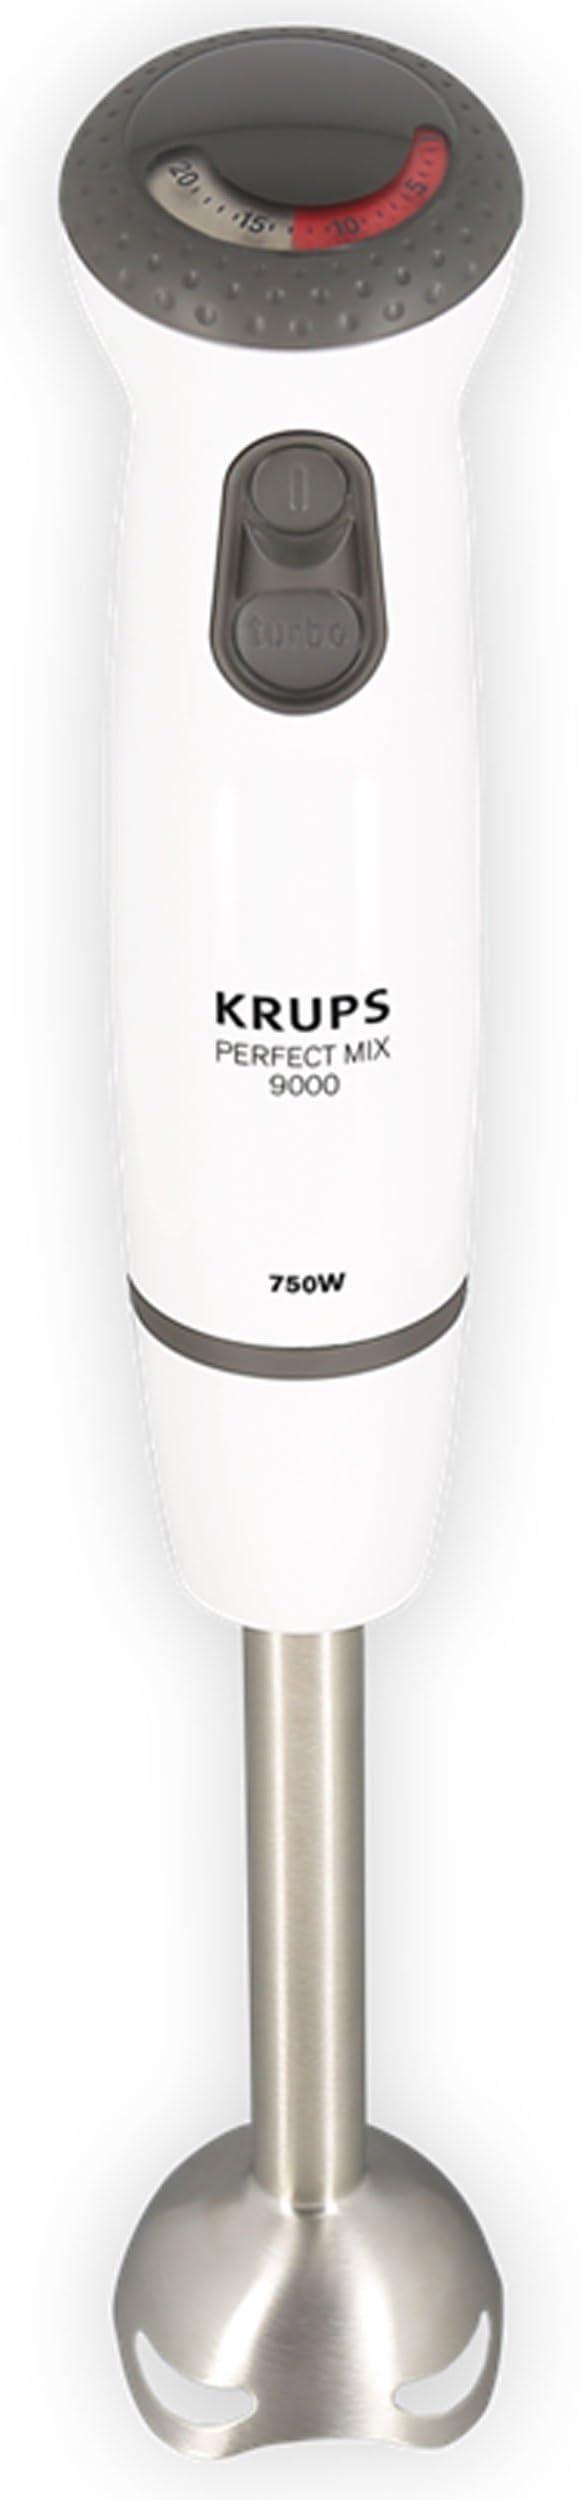 Krups Perfect Mix 9000 Plus Batidora de mano 0.8L 750W Gris, Color ...